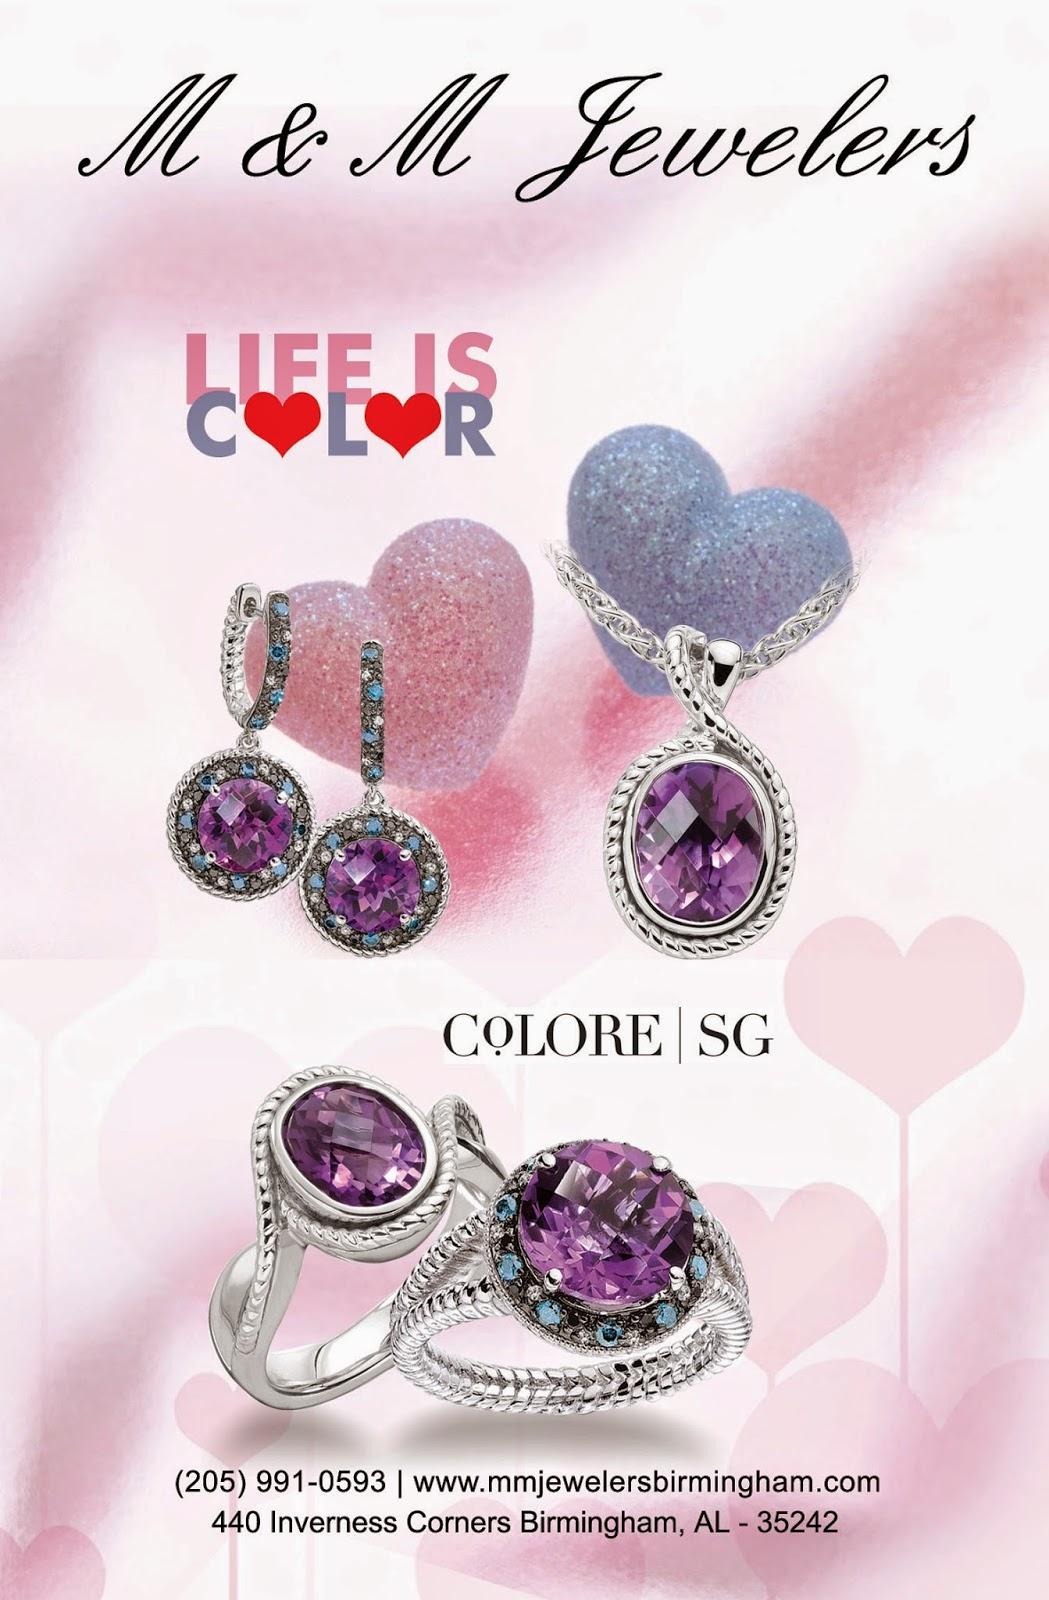 www.mmjewelersbirmingham.com